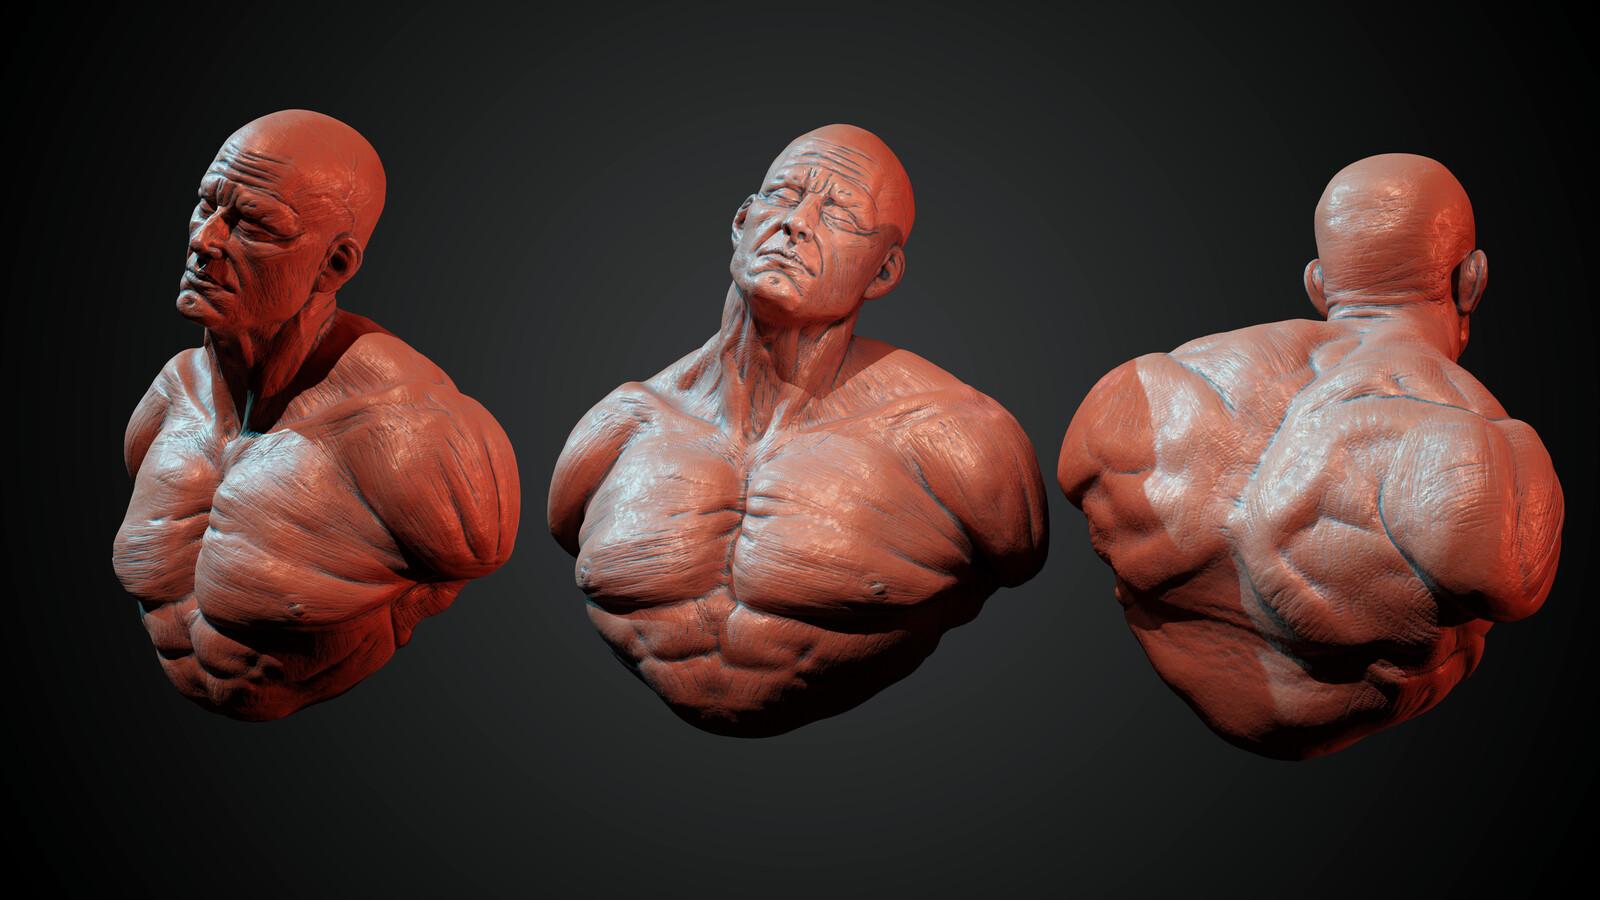 Male Torso sculpting - Timelapse video